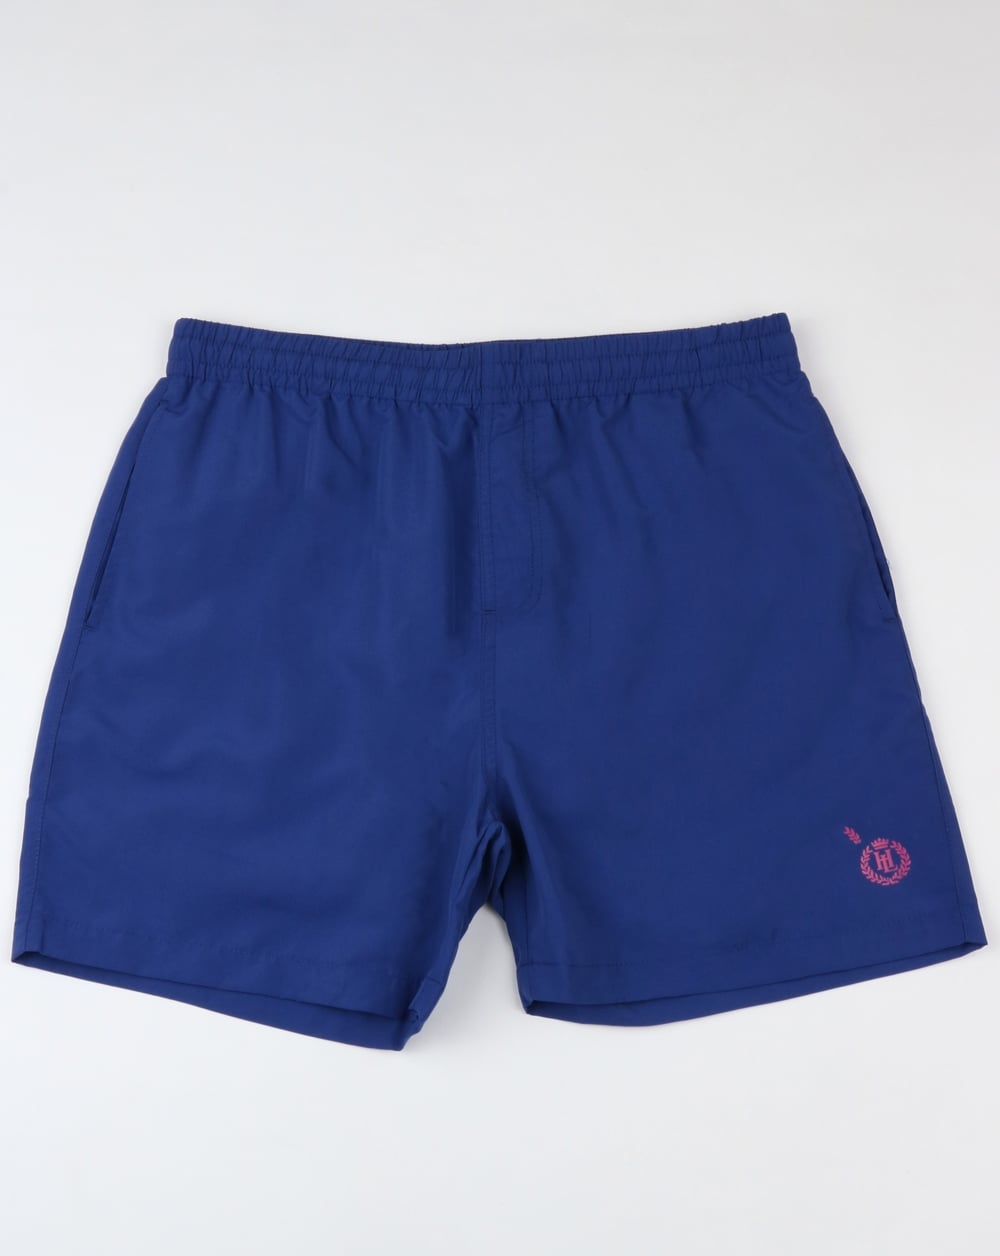 904660e43d Henri Lloyd Brixham Swim Shorts Azure Blue,beach,swimmers,mens